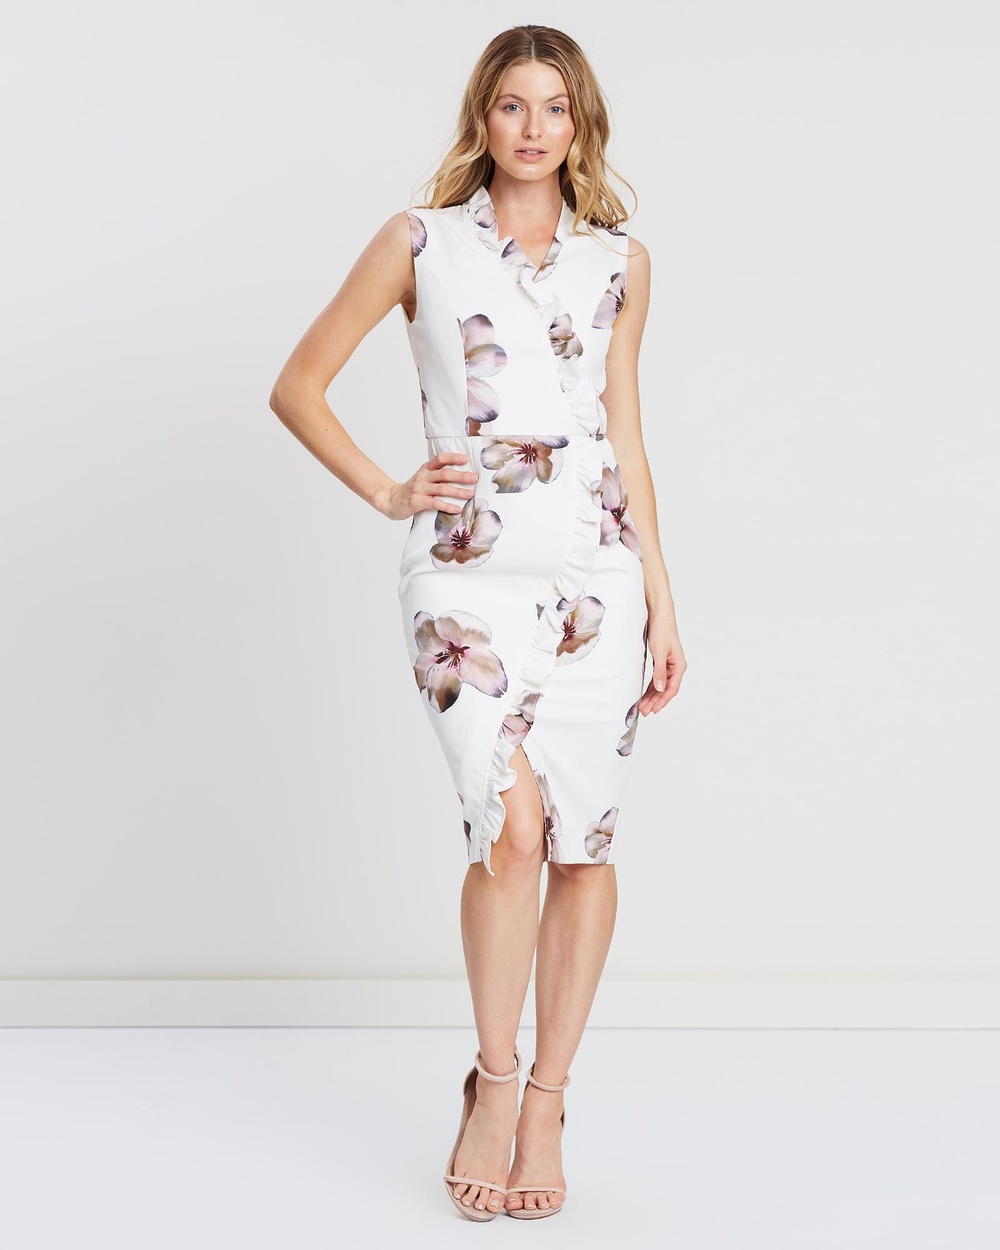 Pink Ruby Nude Print Mariah Cross-Over Dress